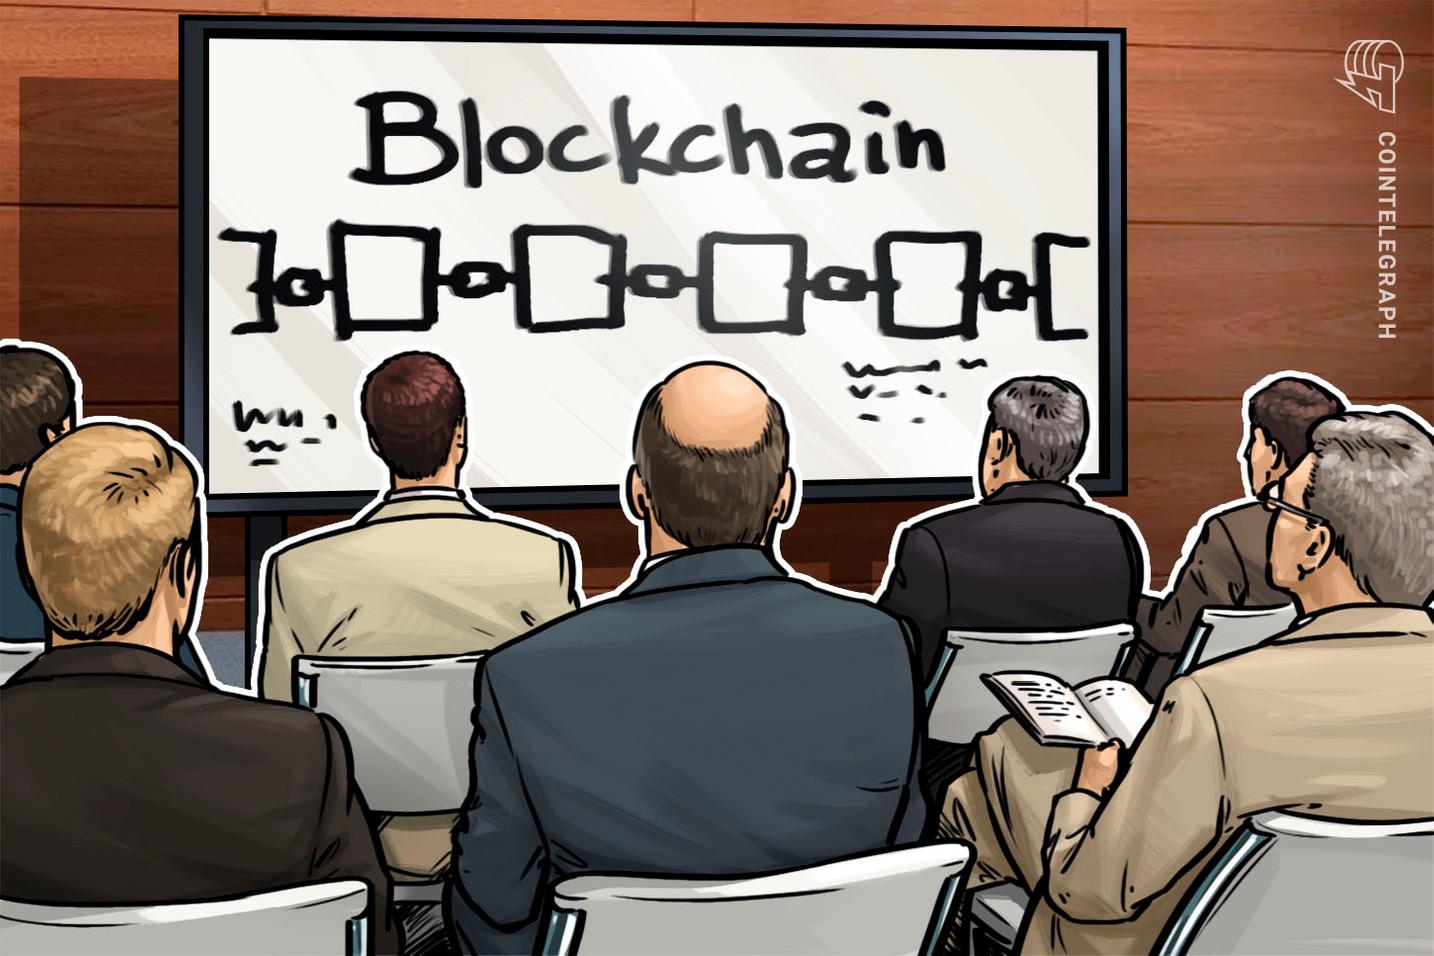 Canadian University Offers Graduate Training in Blockchain Tech